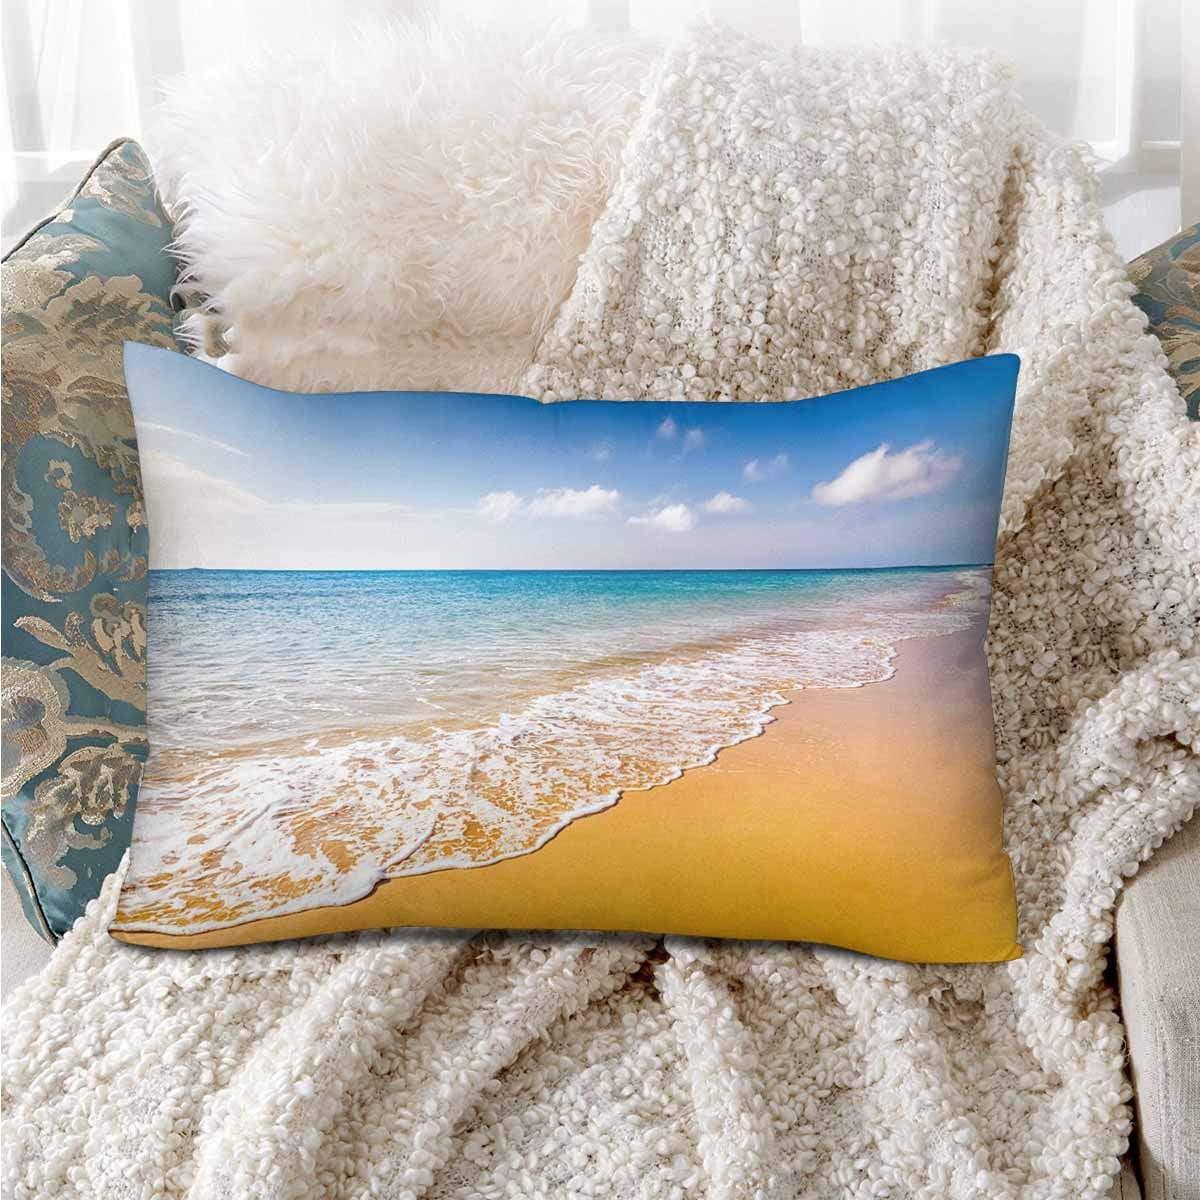 GCKG Beautiful Ocean Beach Summer Vacation Pillow Cases Pillowcase 20x30 inches - image 3 de 4